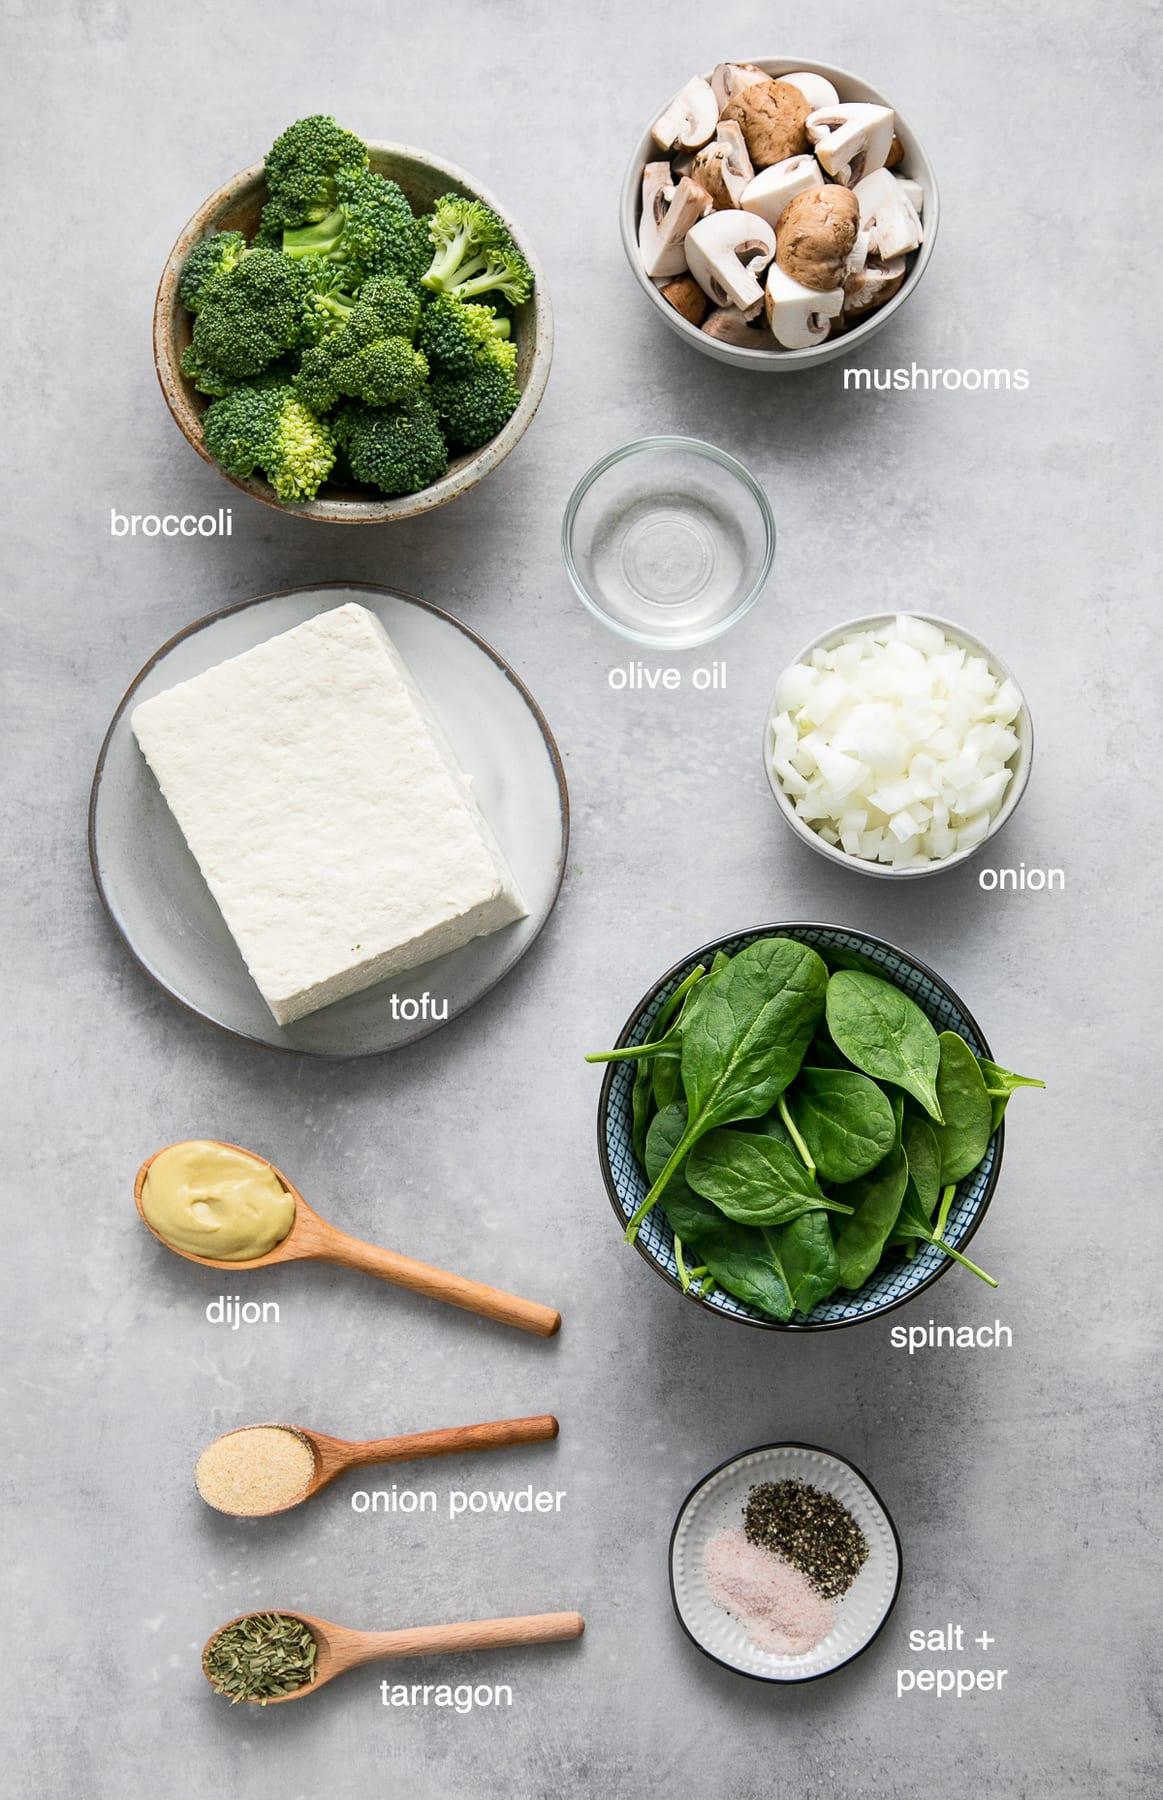 top down view of ingredients used to make vegan scrambled eggs with tofu, dijon, tarragon and veggies.